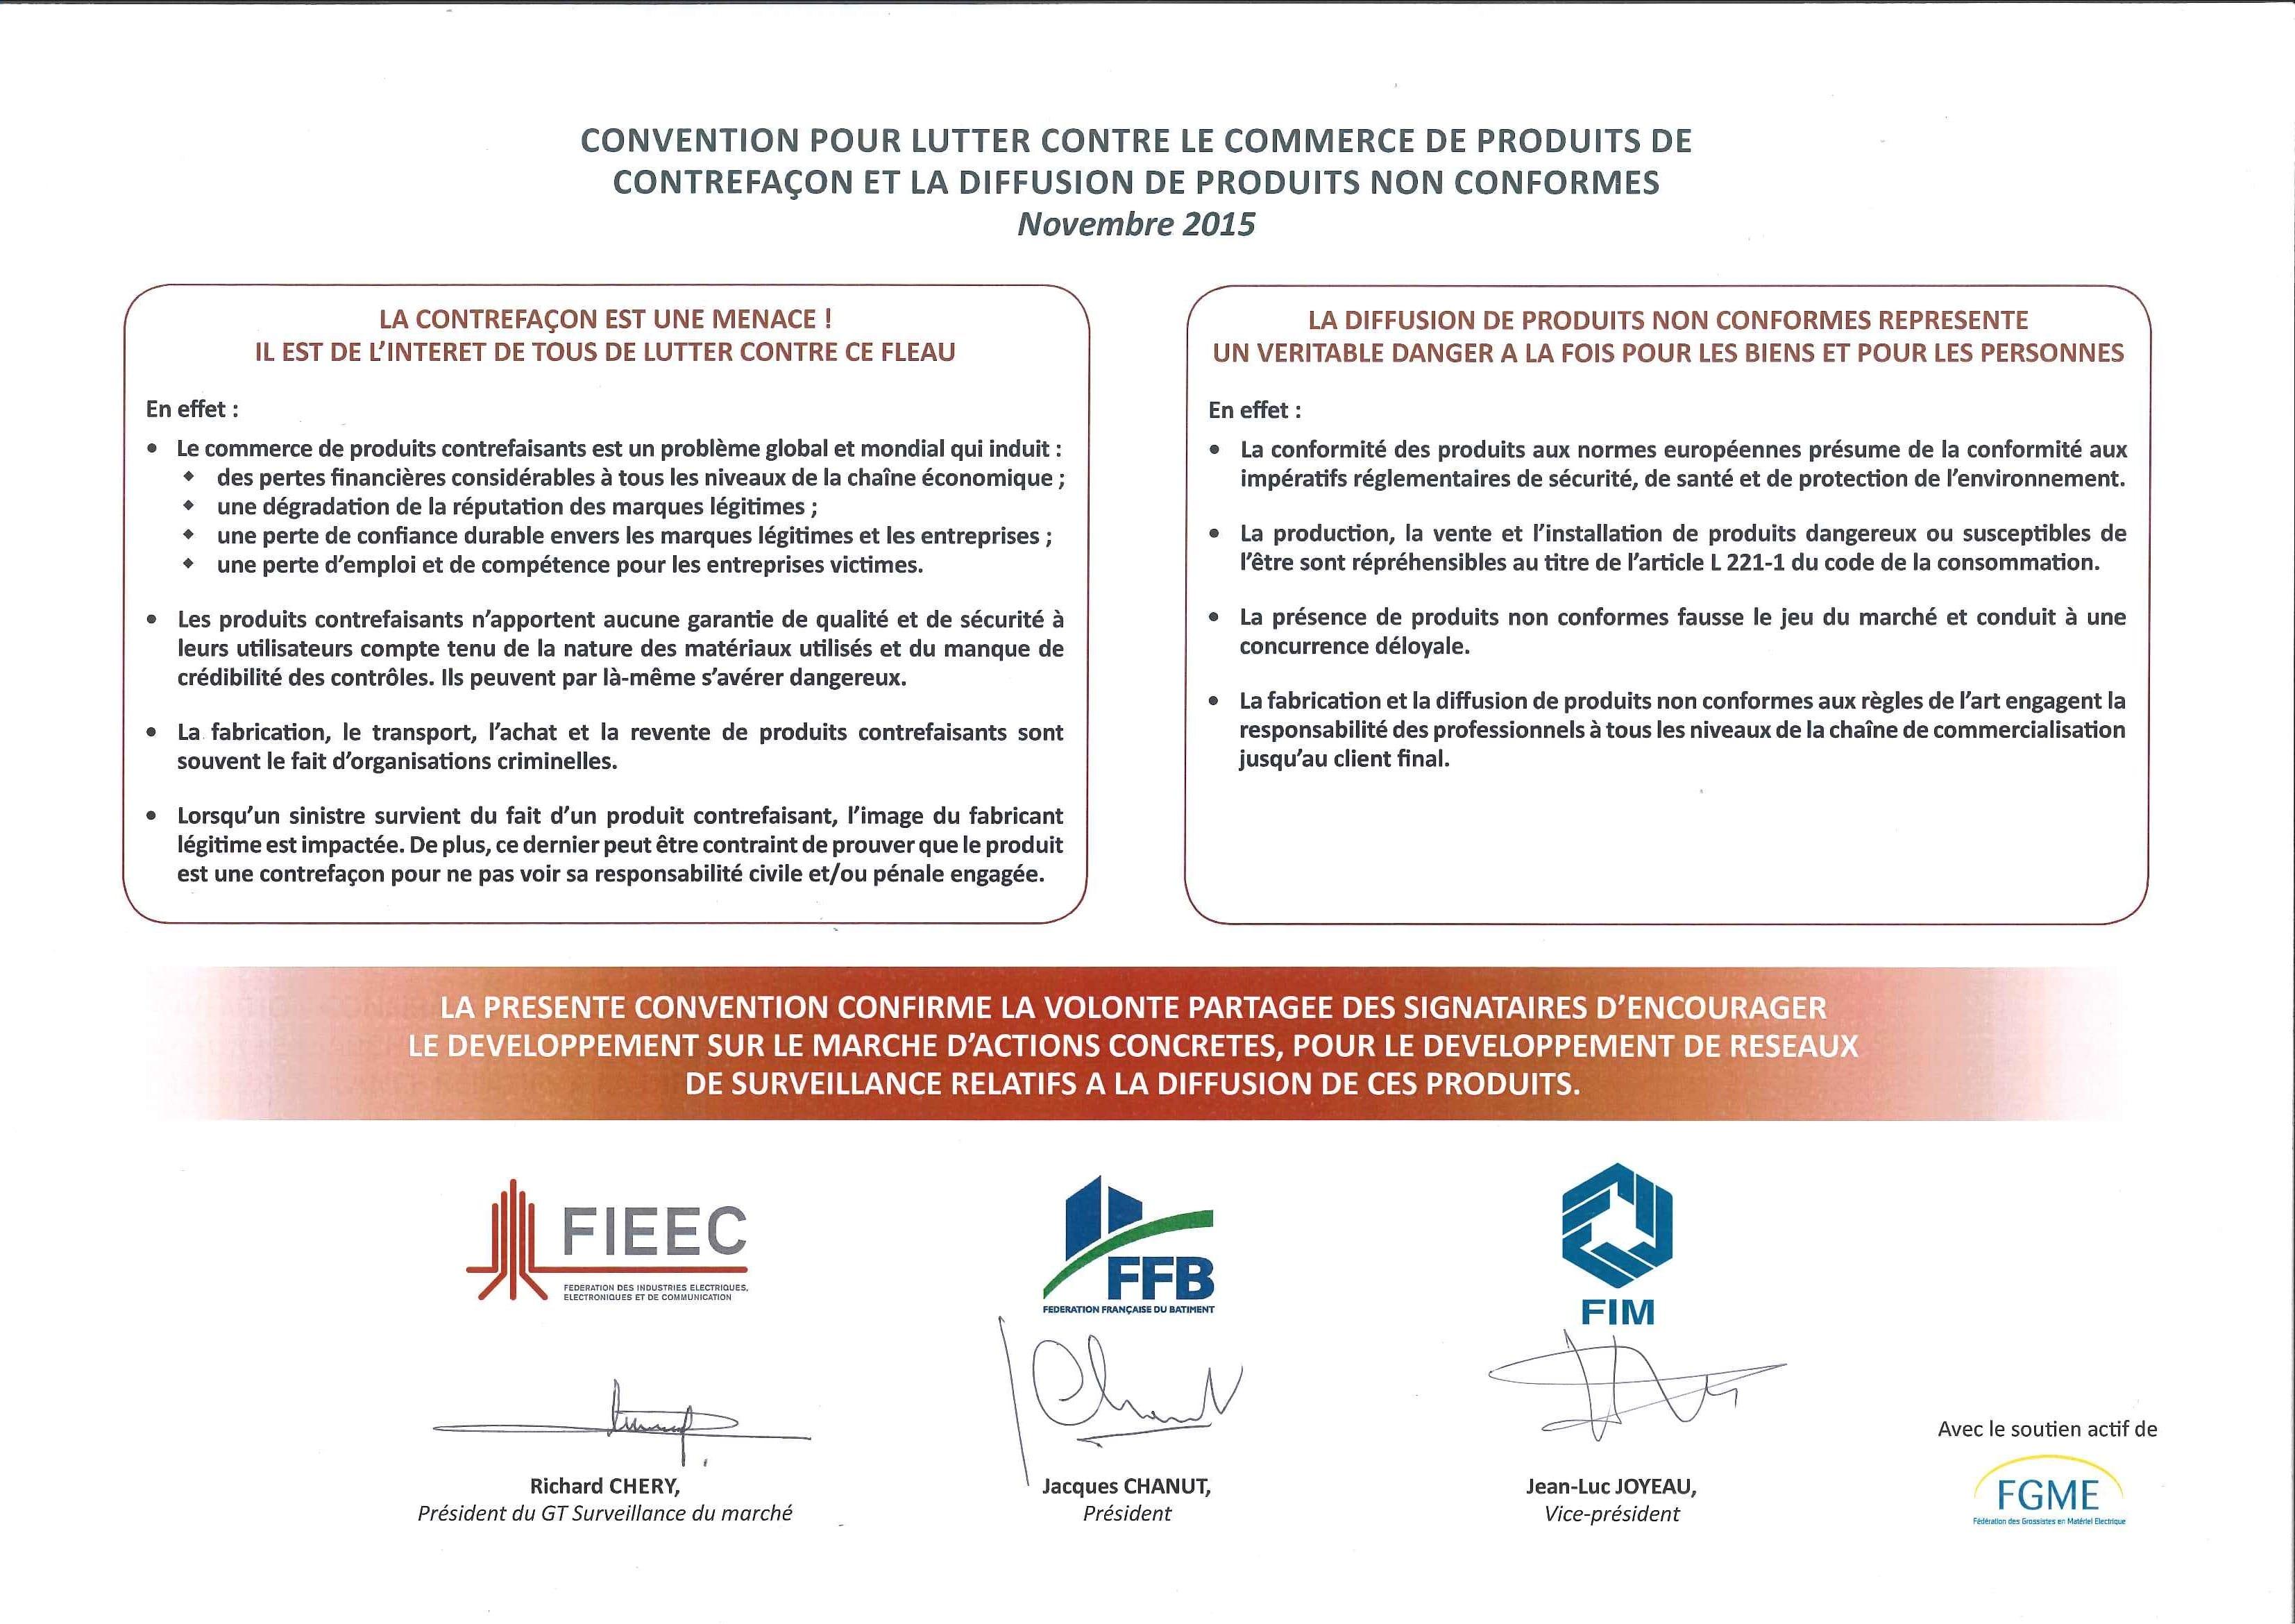 Charte FIEEC - FFB - FIM - novembre 2015 signé